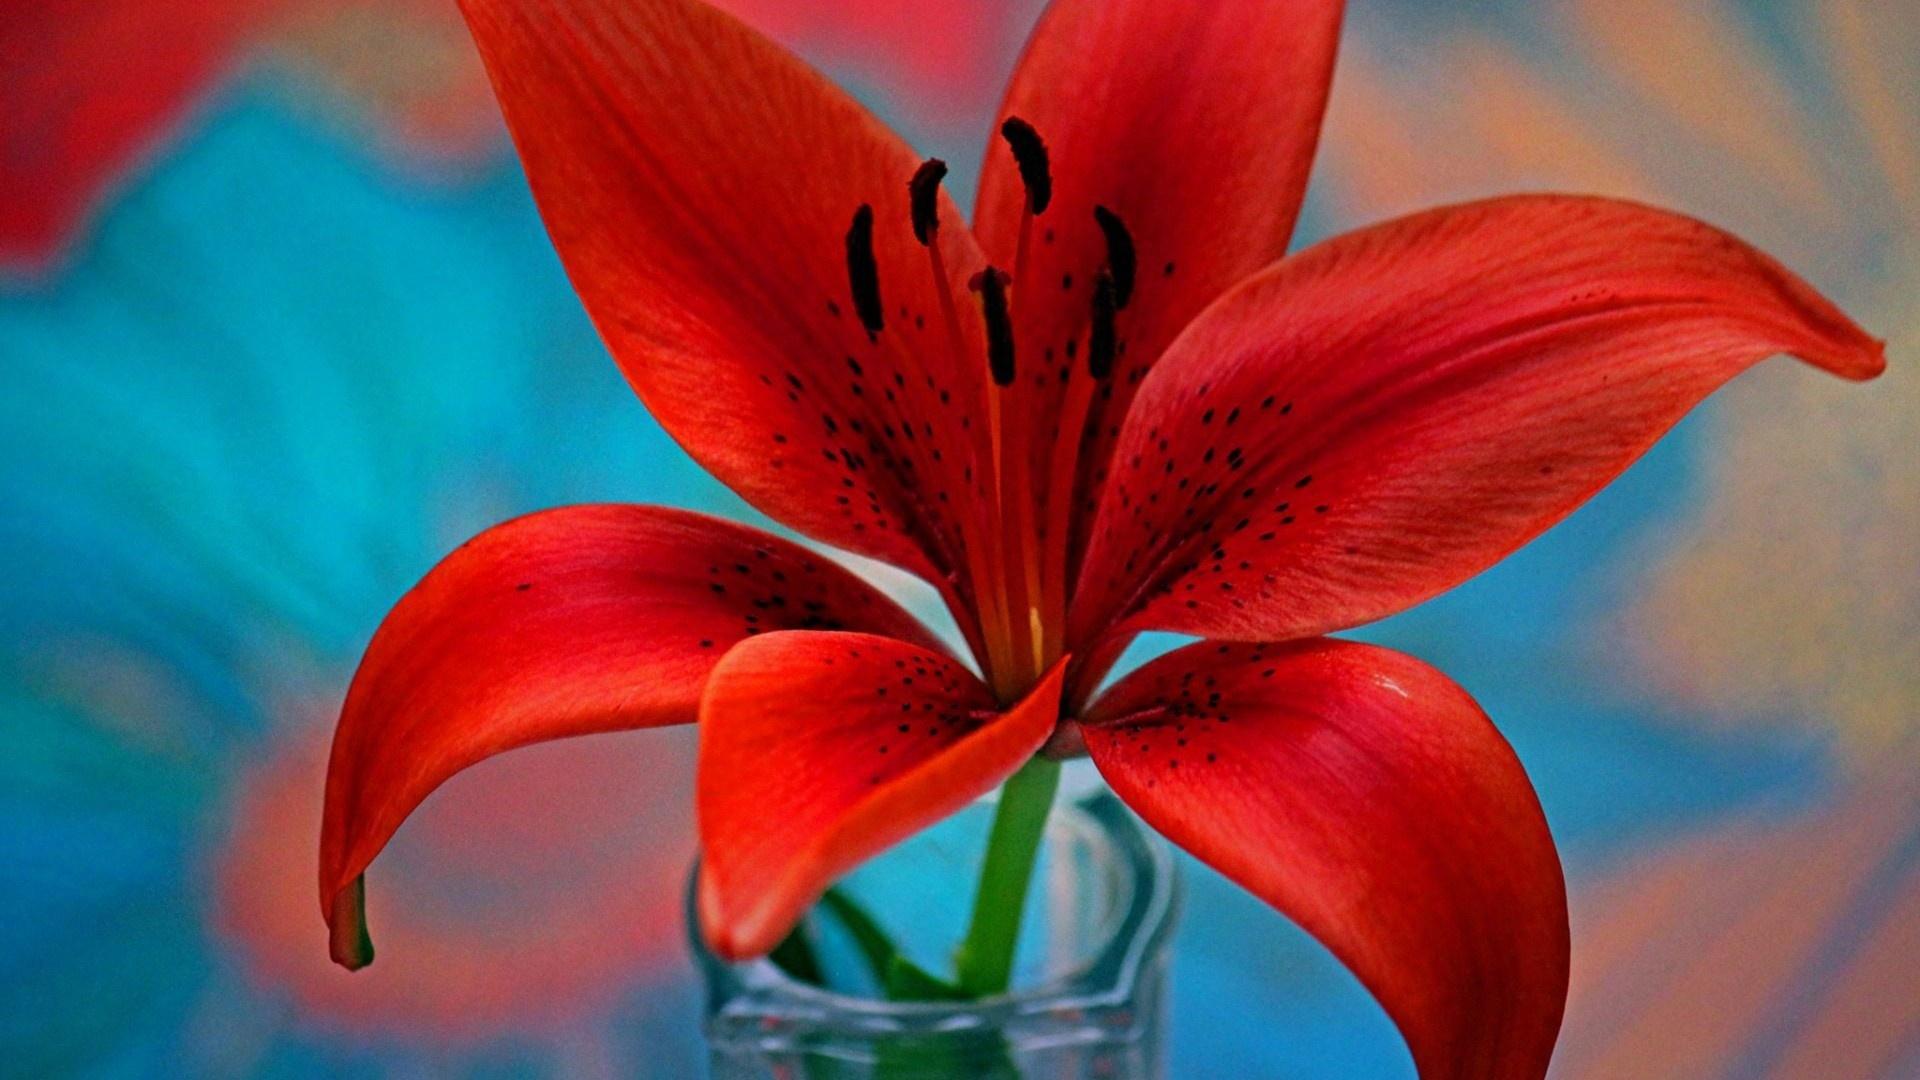 Lily Flower HD Wallpaper